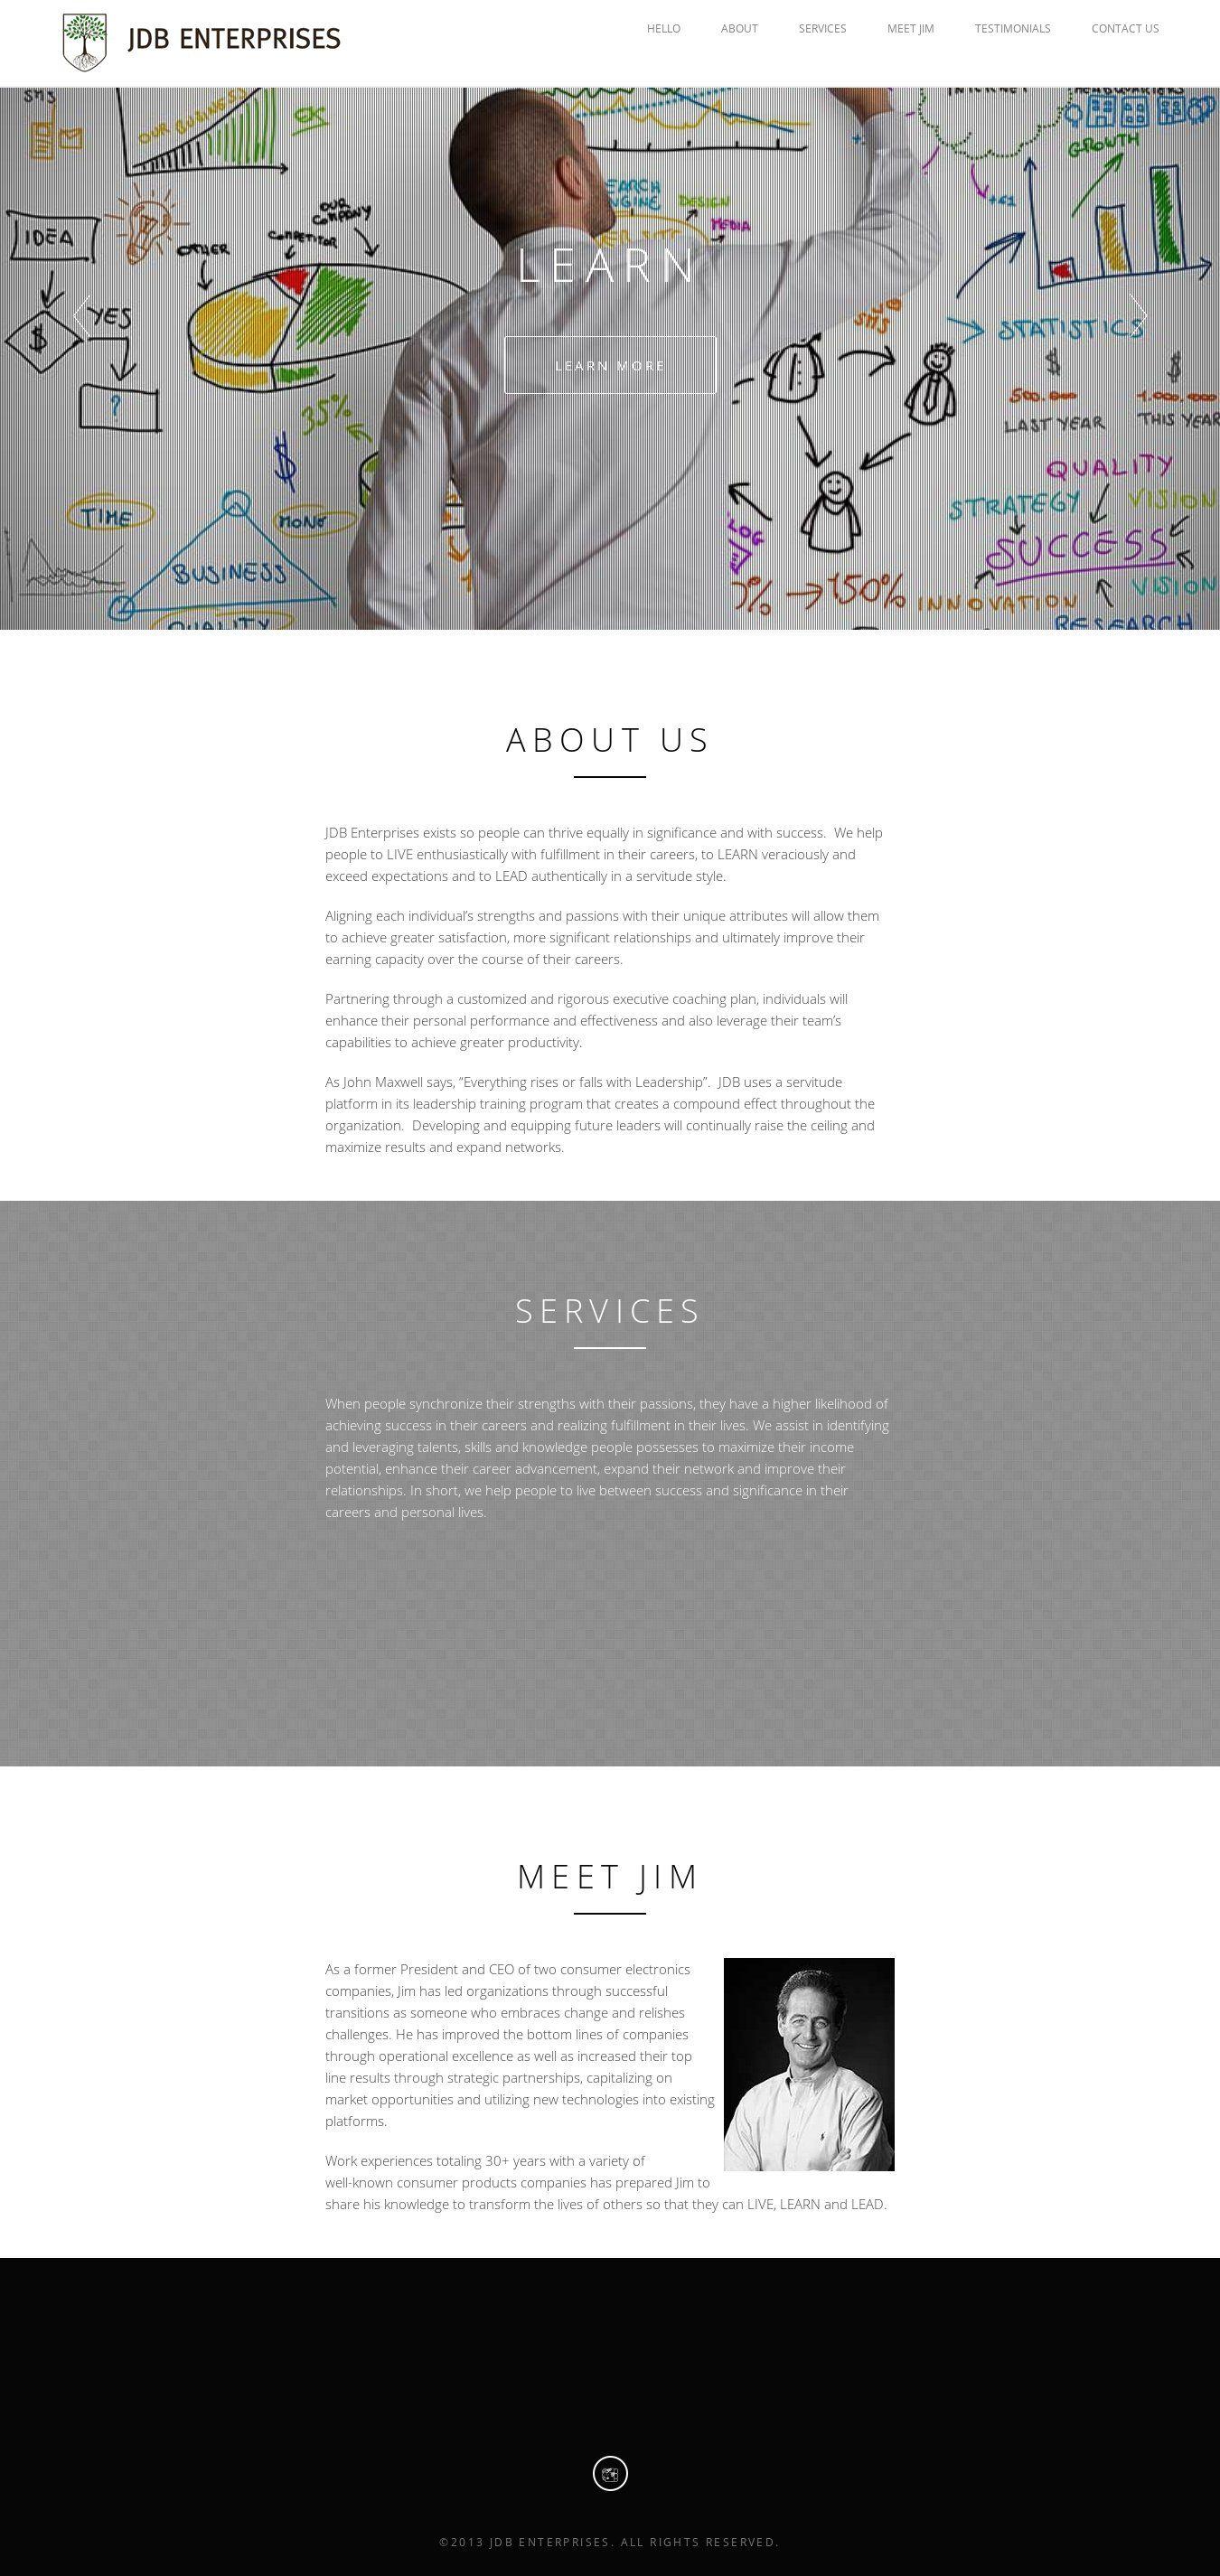 WordPress site jdbenterprises.net uses the